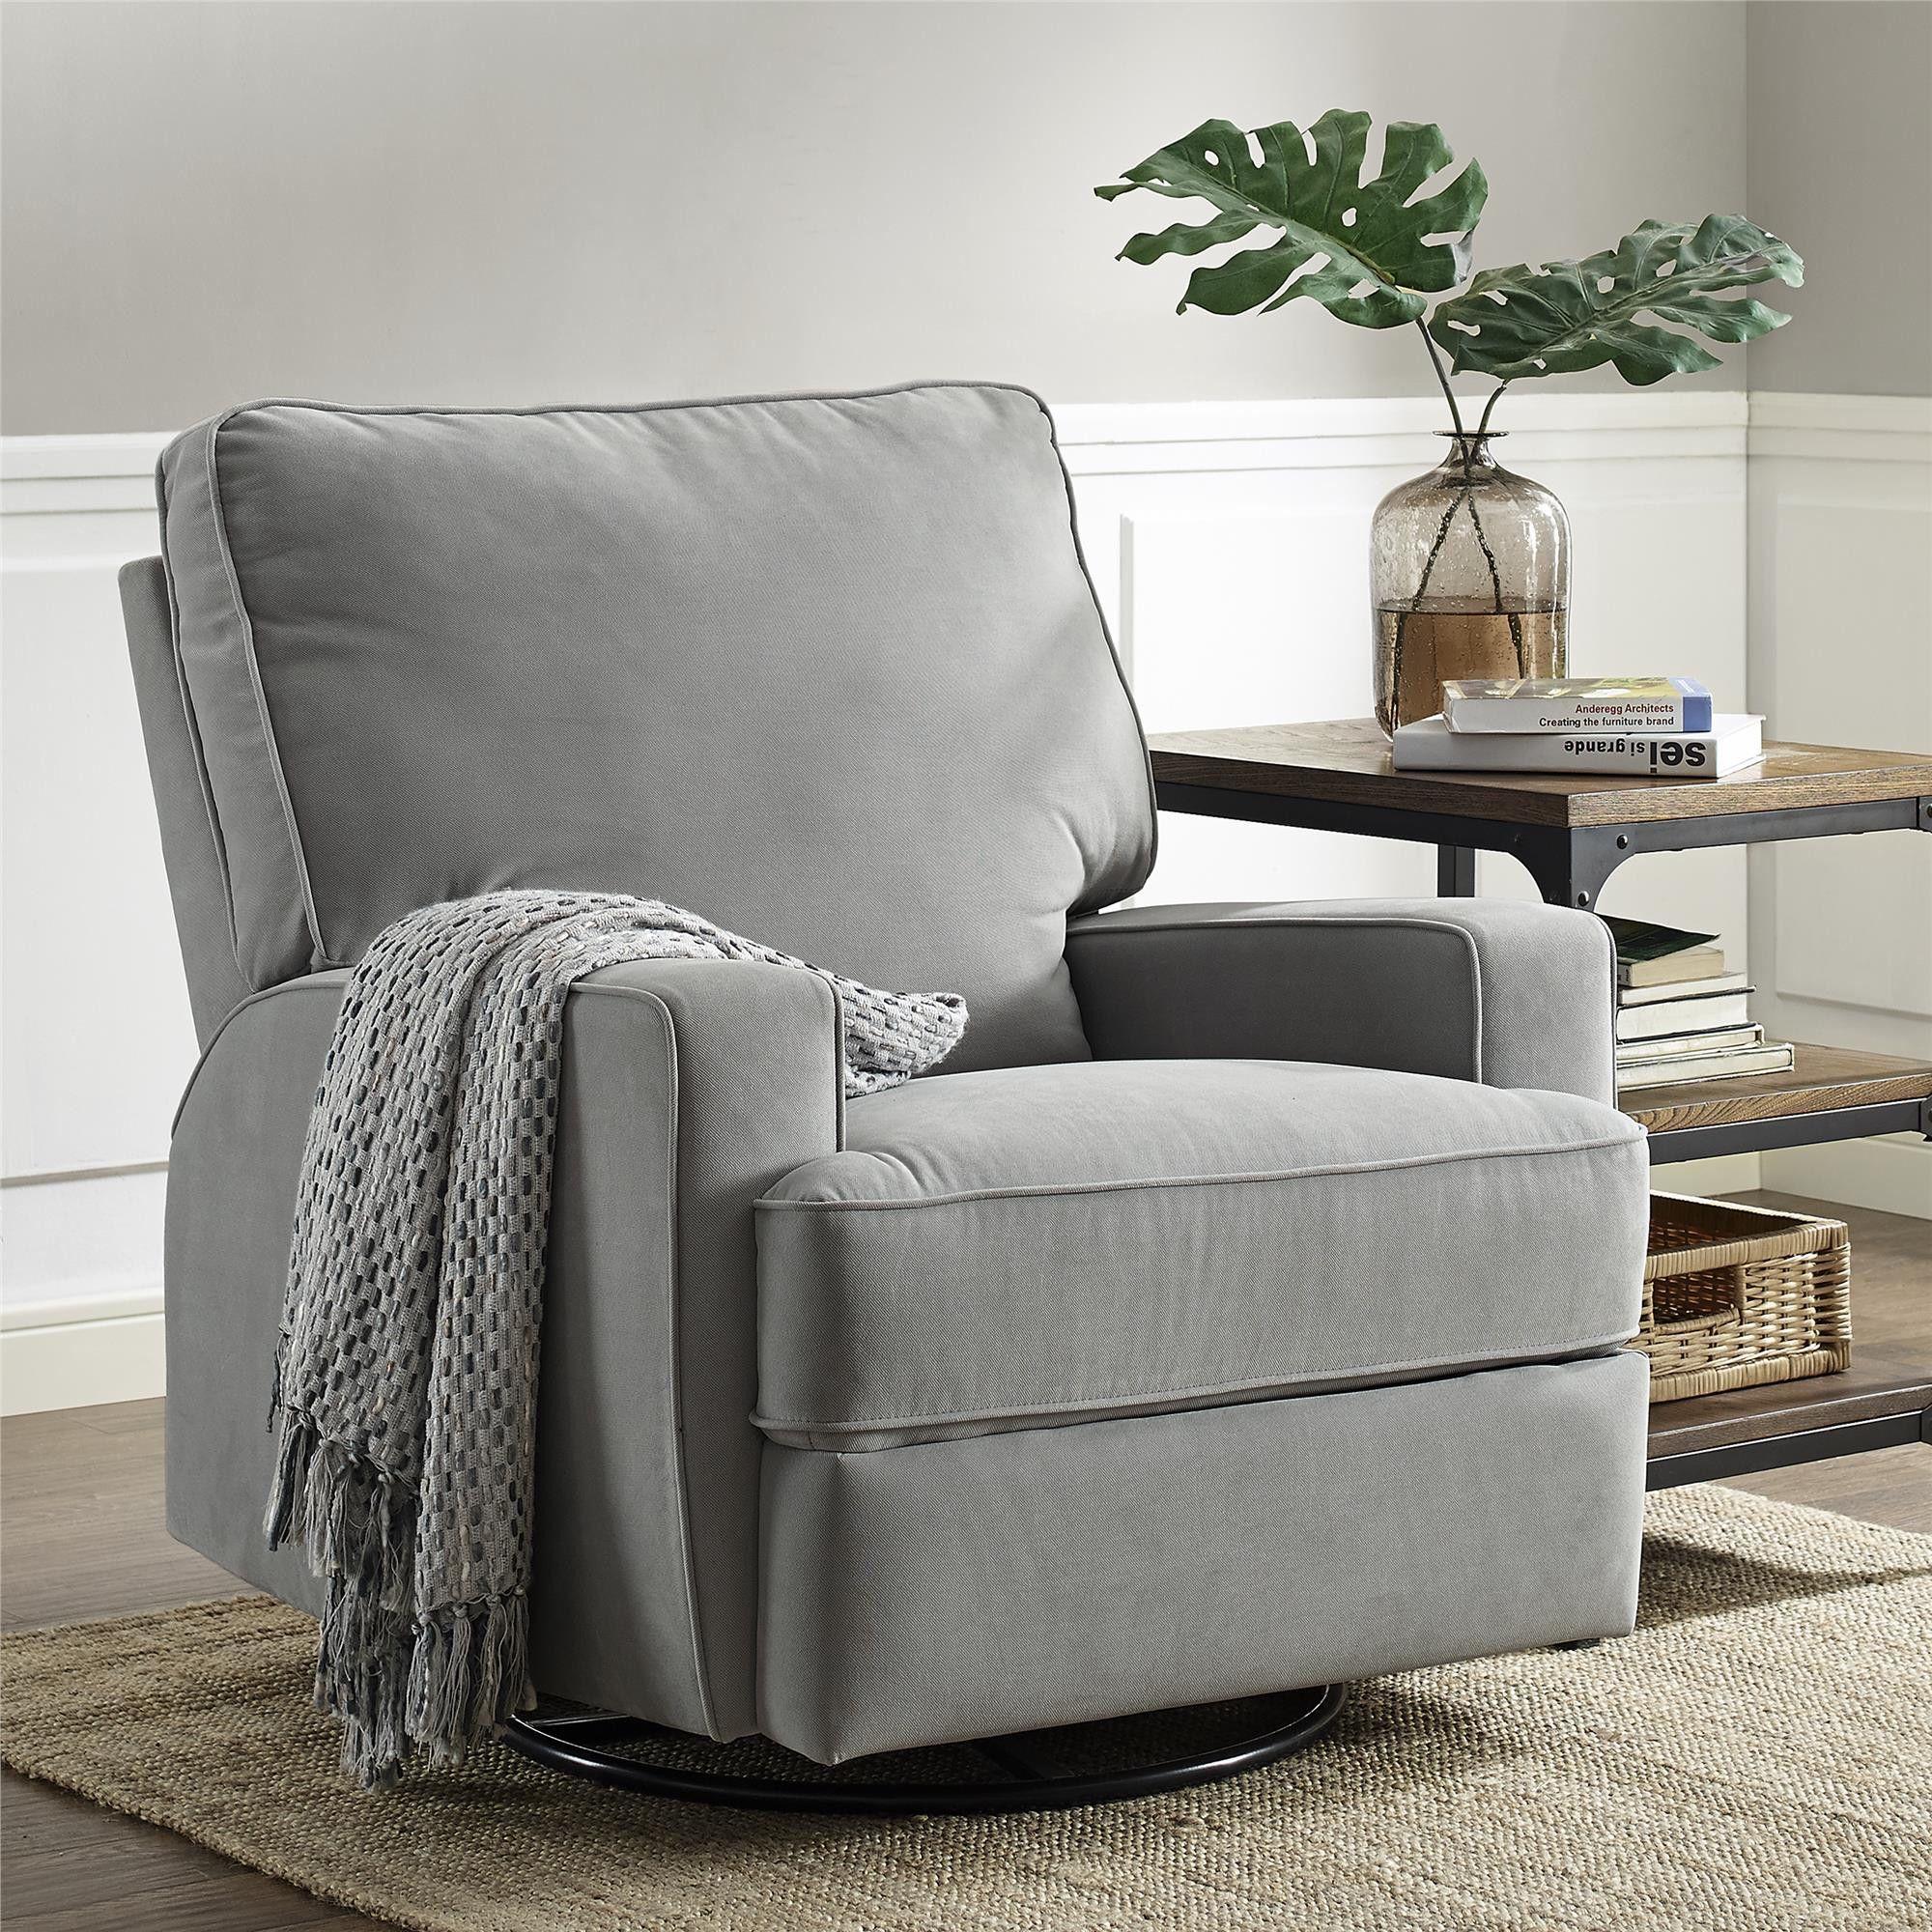 Swivel Recliner Chairs Glider